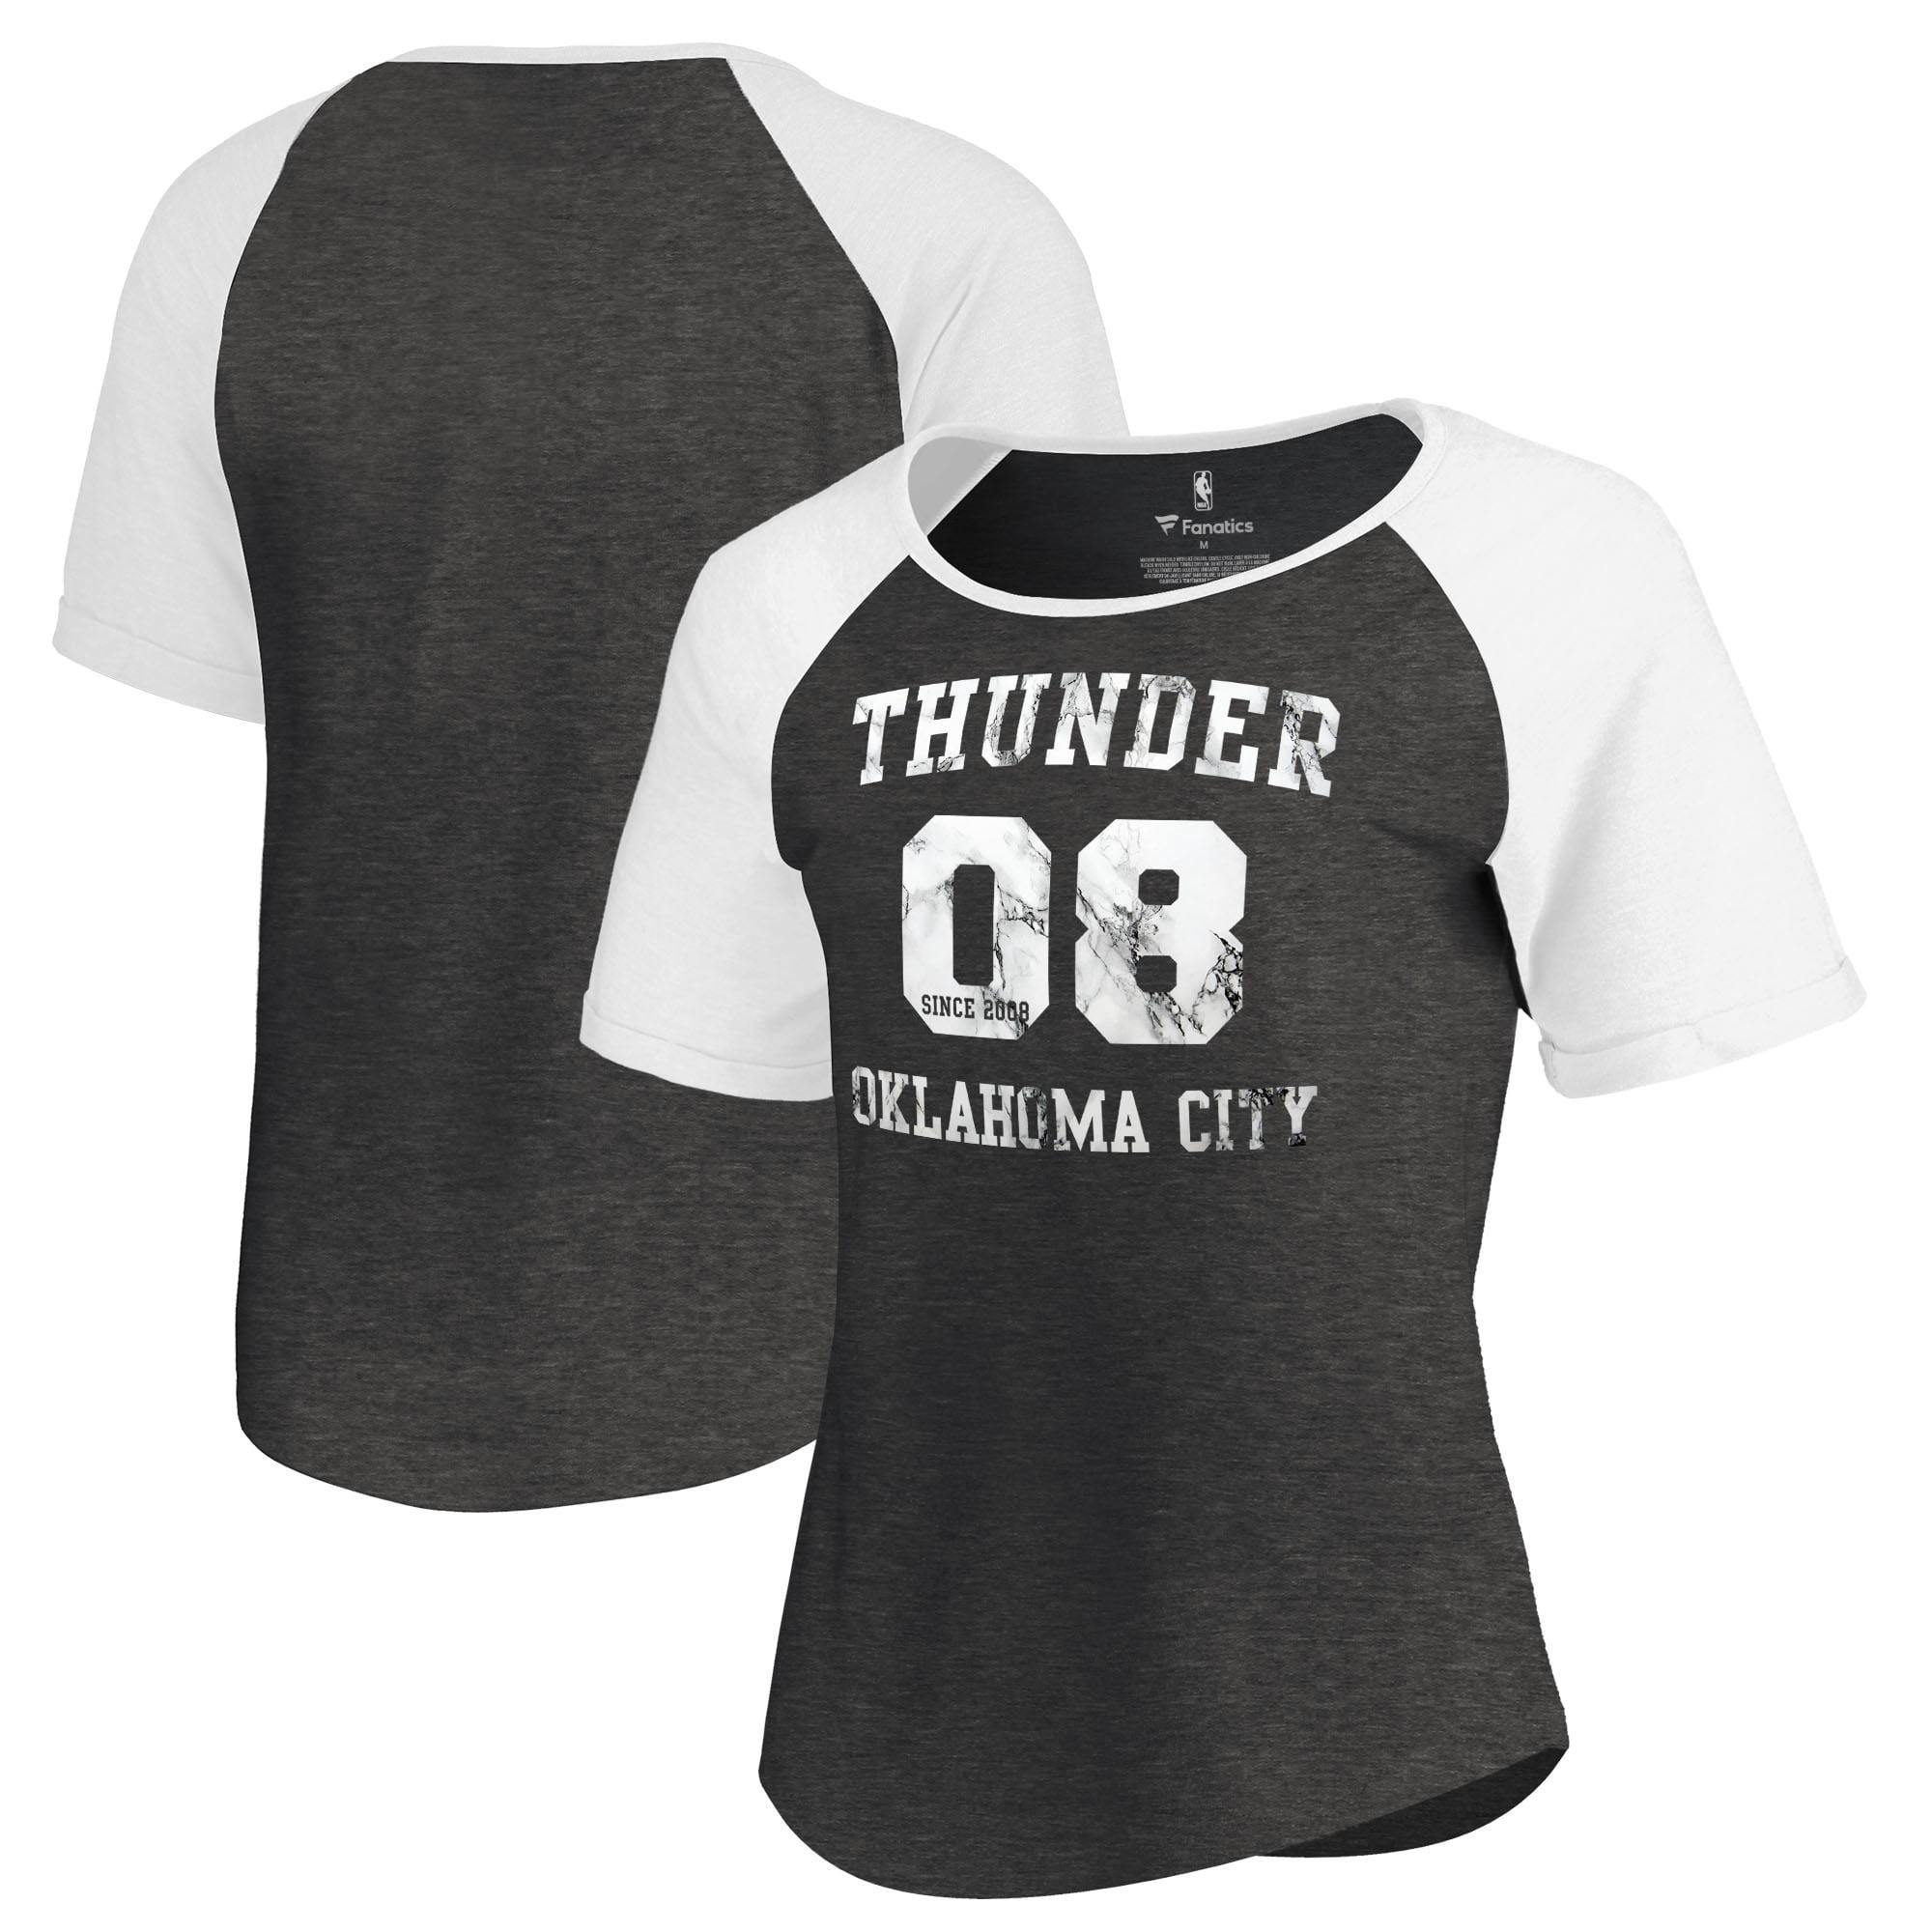 Oklahoma City Thunder Fanatics Branded Women's Hang Time Short Sleeve Raglan T-Shirt - Black